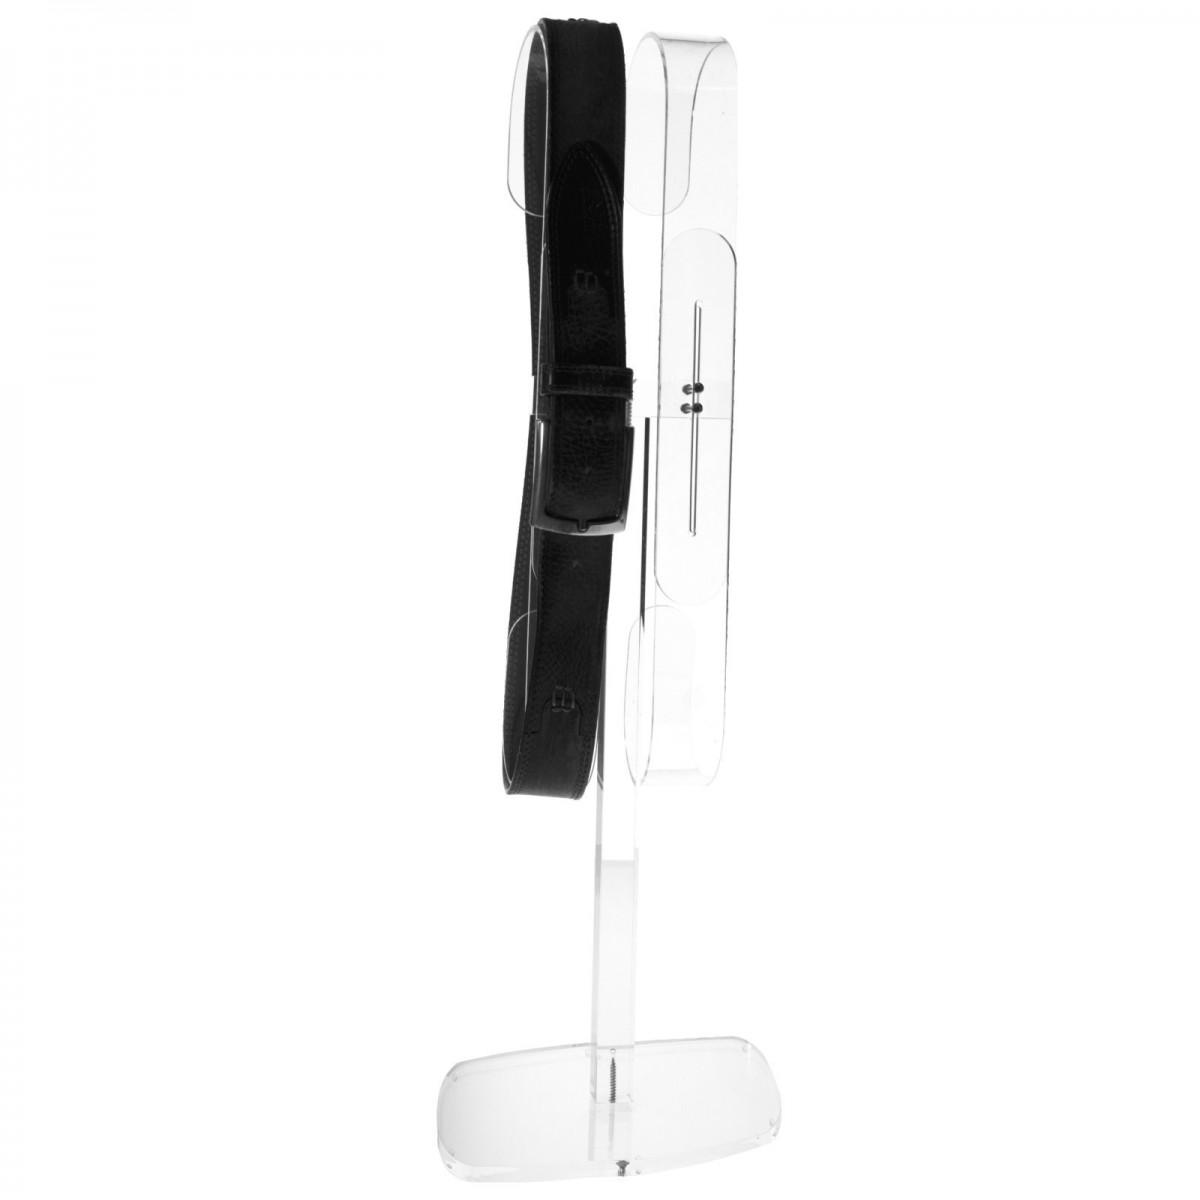 E-297 - Porta cintura regolabile in plexiglass trasparente